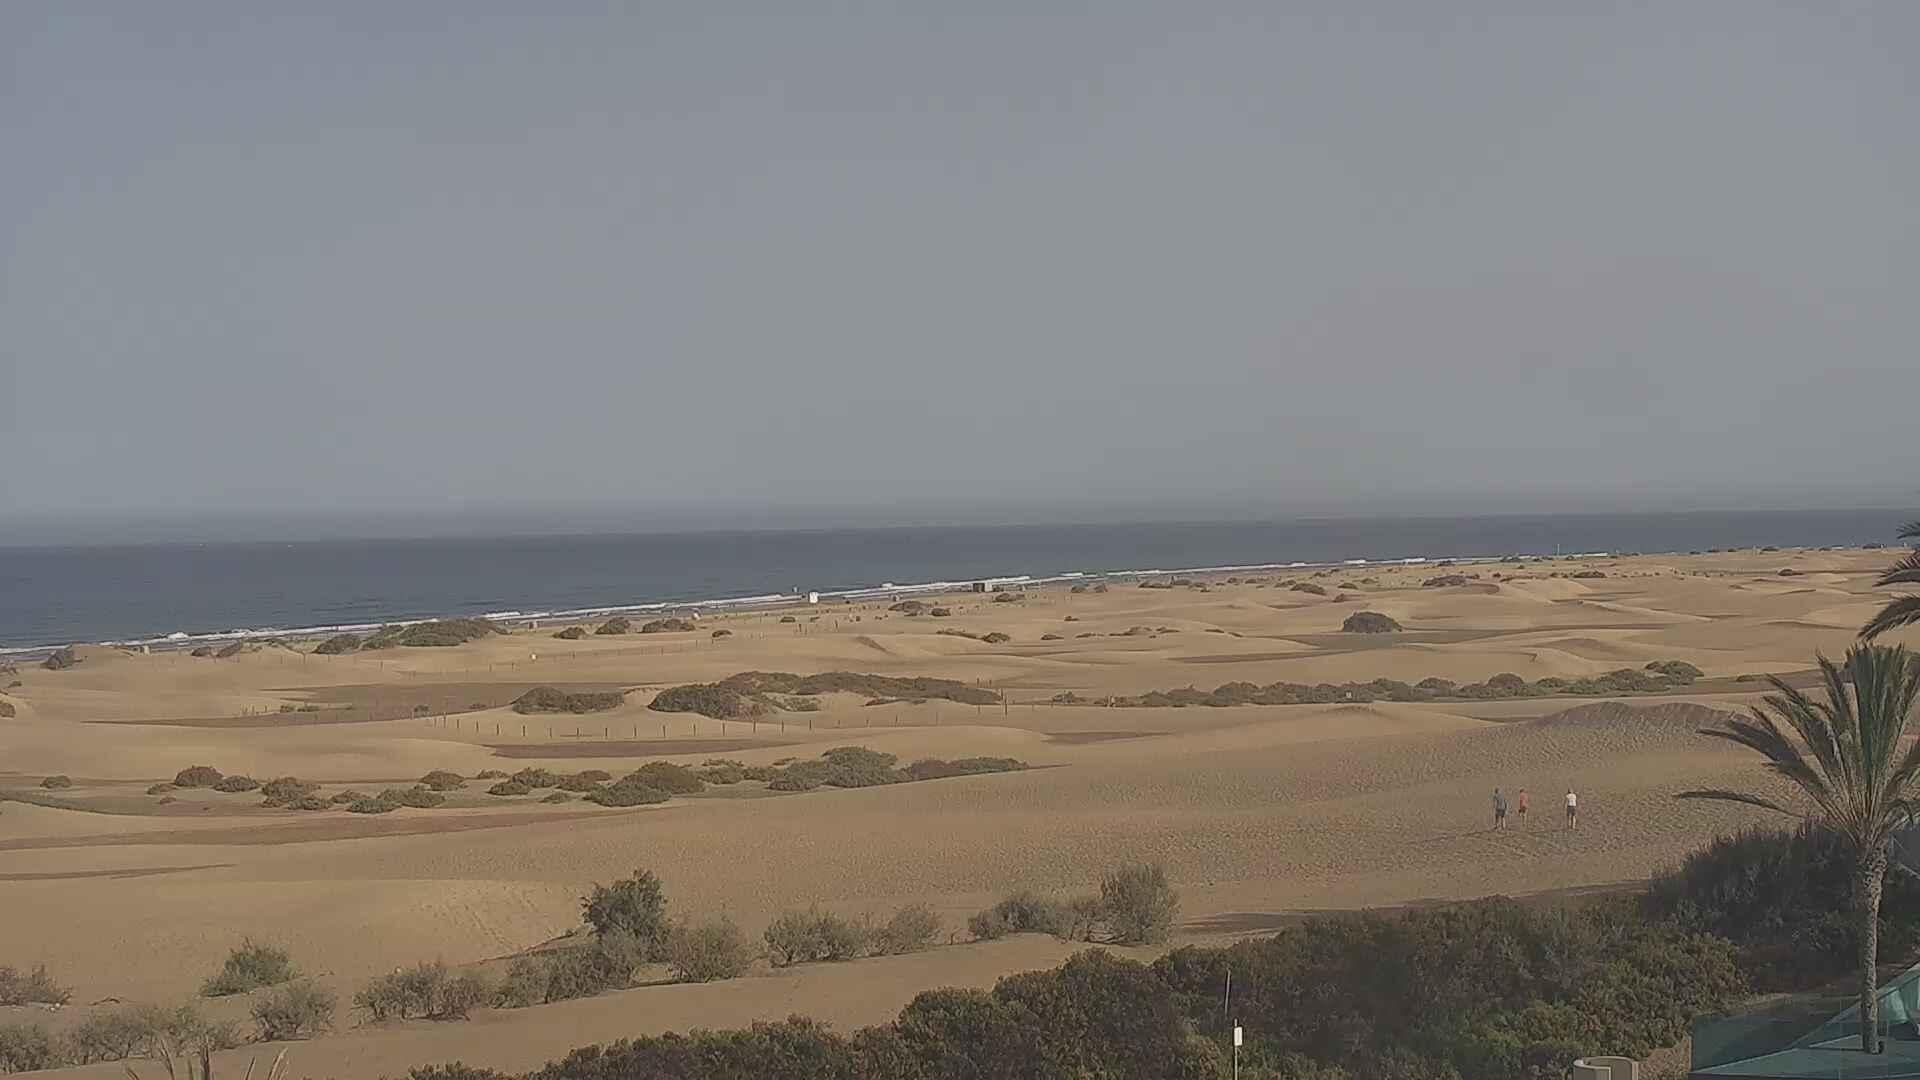 Playa del Ingles (Gran Canaria) Sat. 18:36